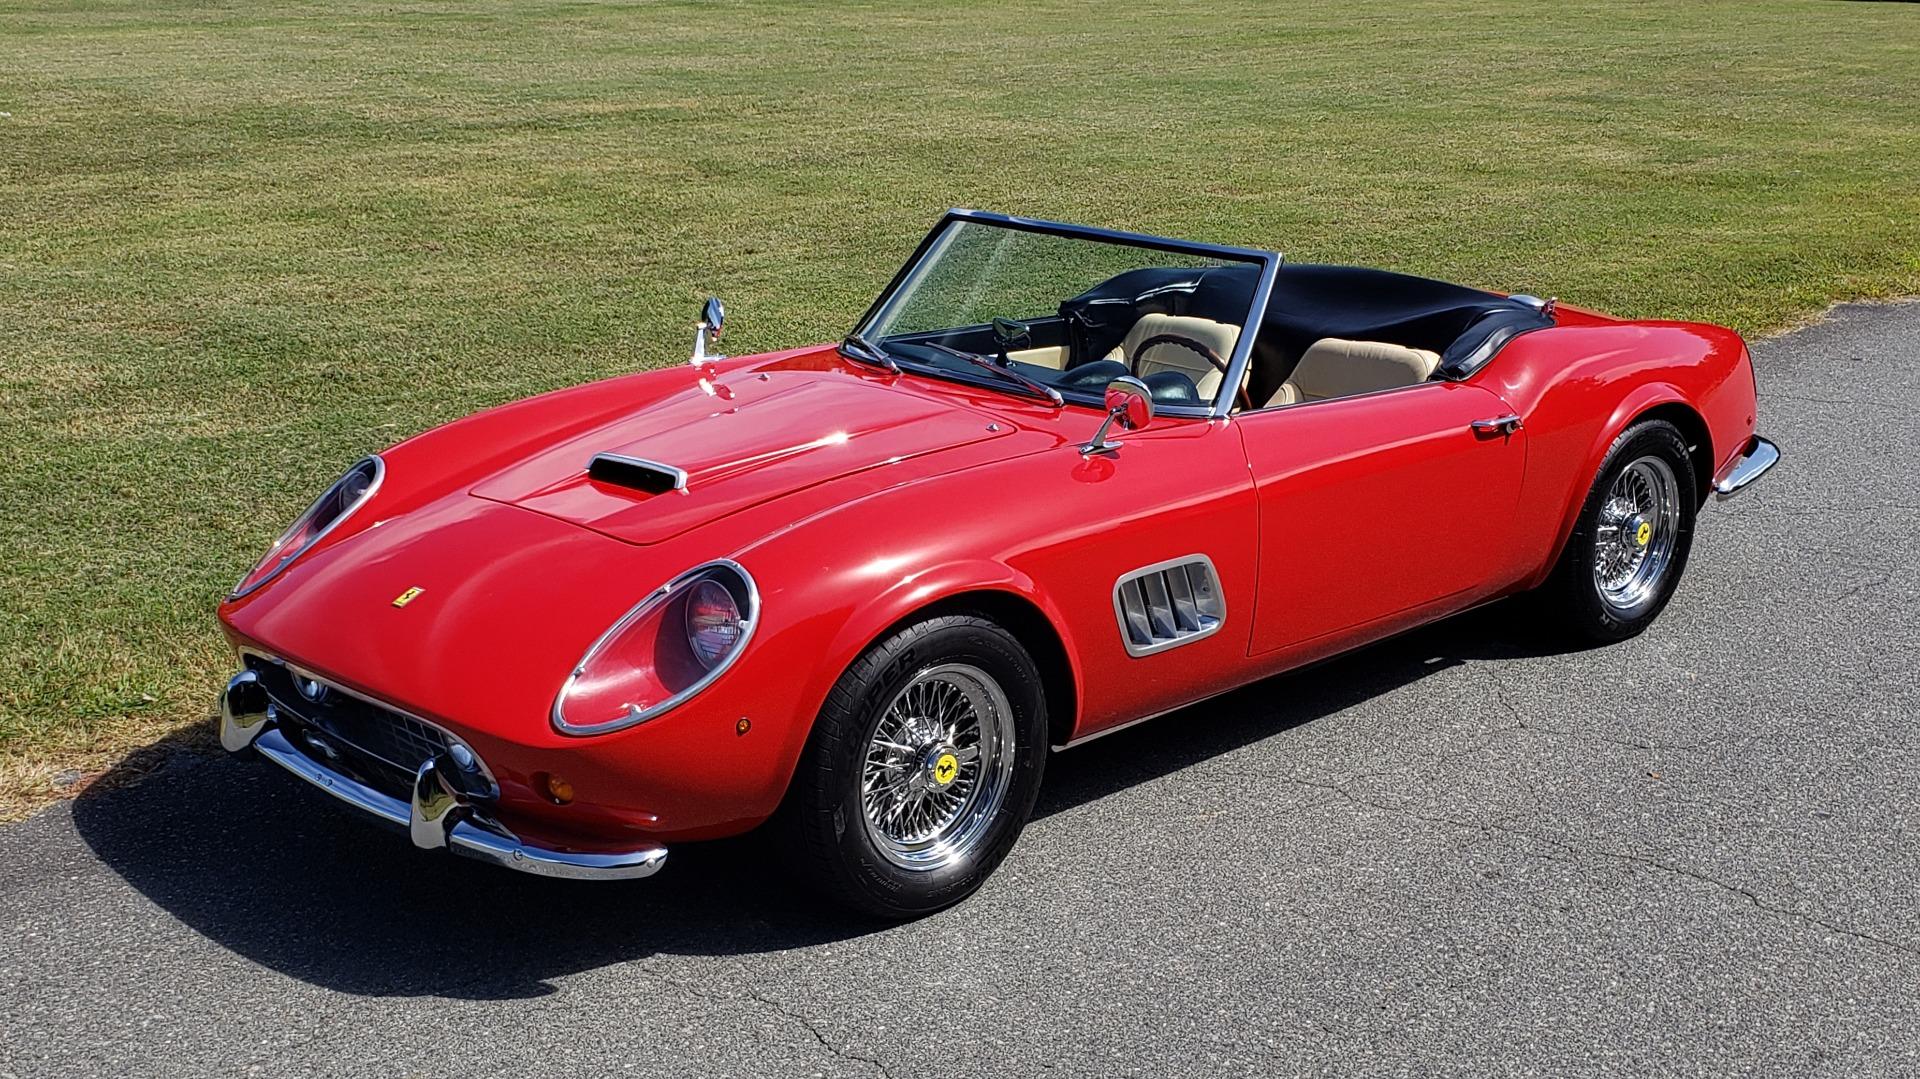 Used 1961 Ferrari 250GT SWB CALIFORNIA REPLICA / 302CI V8 / TREMEC 5-SPEED for sale Sold at Formula Imports in Charlotte NC 28227 15